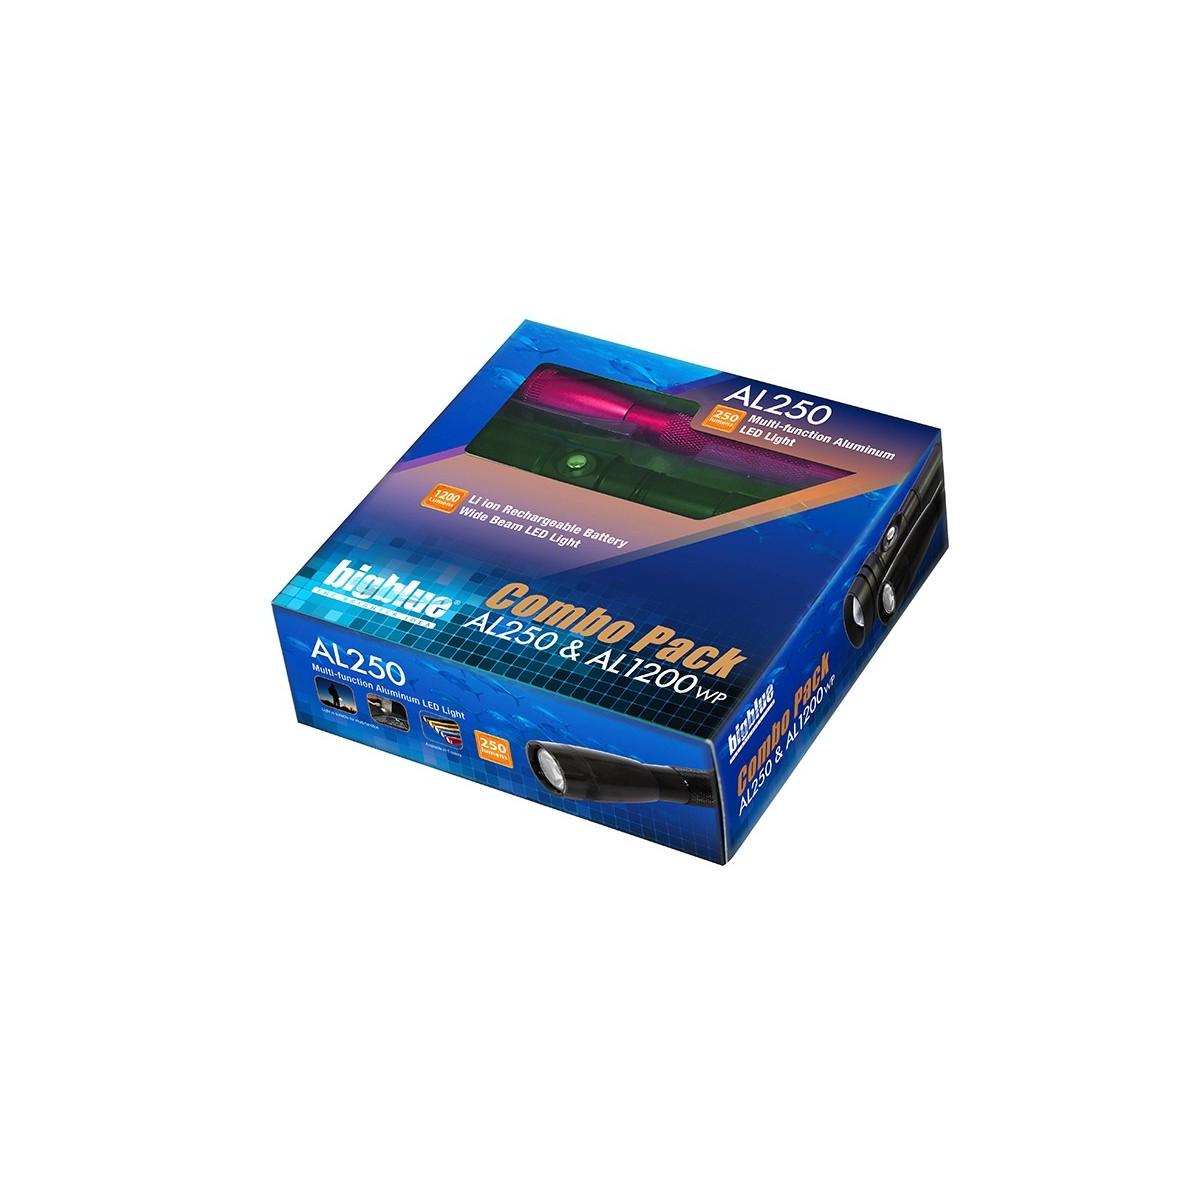 Bigblue Combo Pack AL250 & AL1200WP